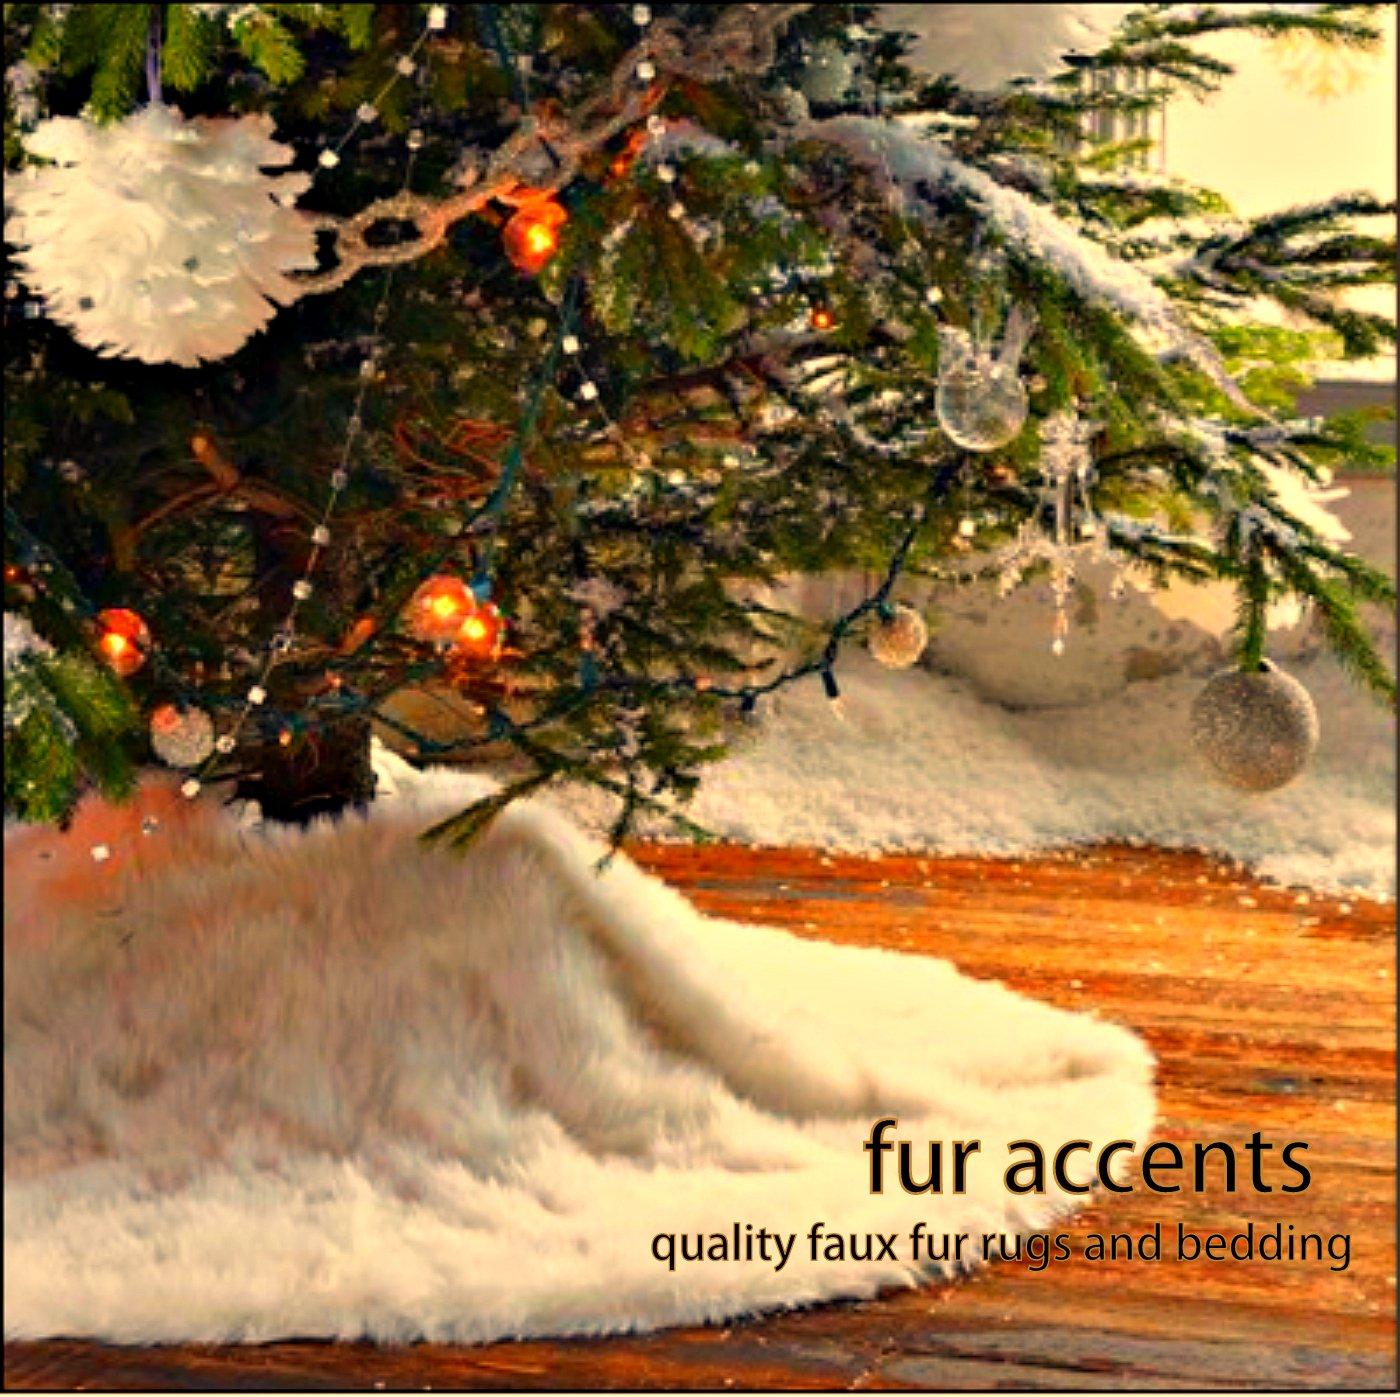 Christmas Tree Skirt Images Part - 27: Amazon.com: Fur Accents Christmas Holiday Tree Skirt, Plush Shaggy Faux Fur  (Snow White, 30u0027u0027 Diameter): Home U0026 Kitchen